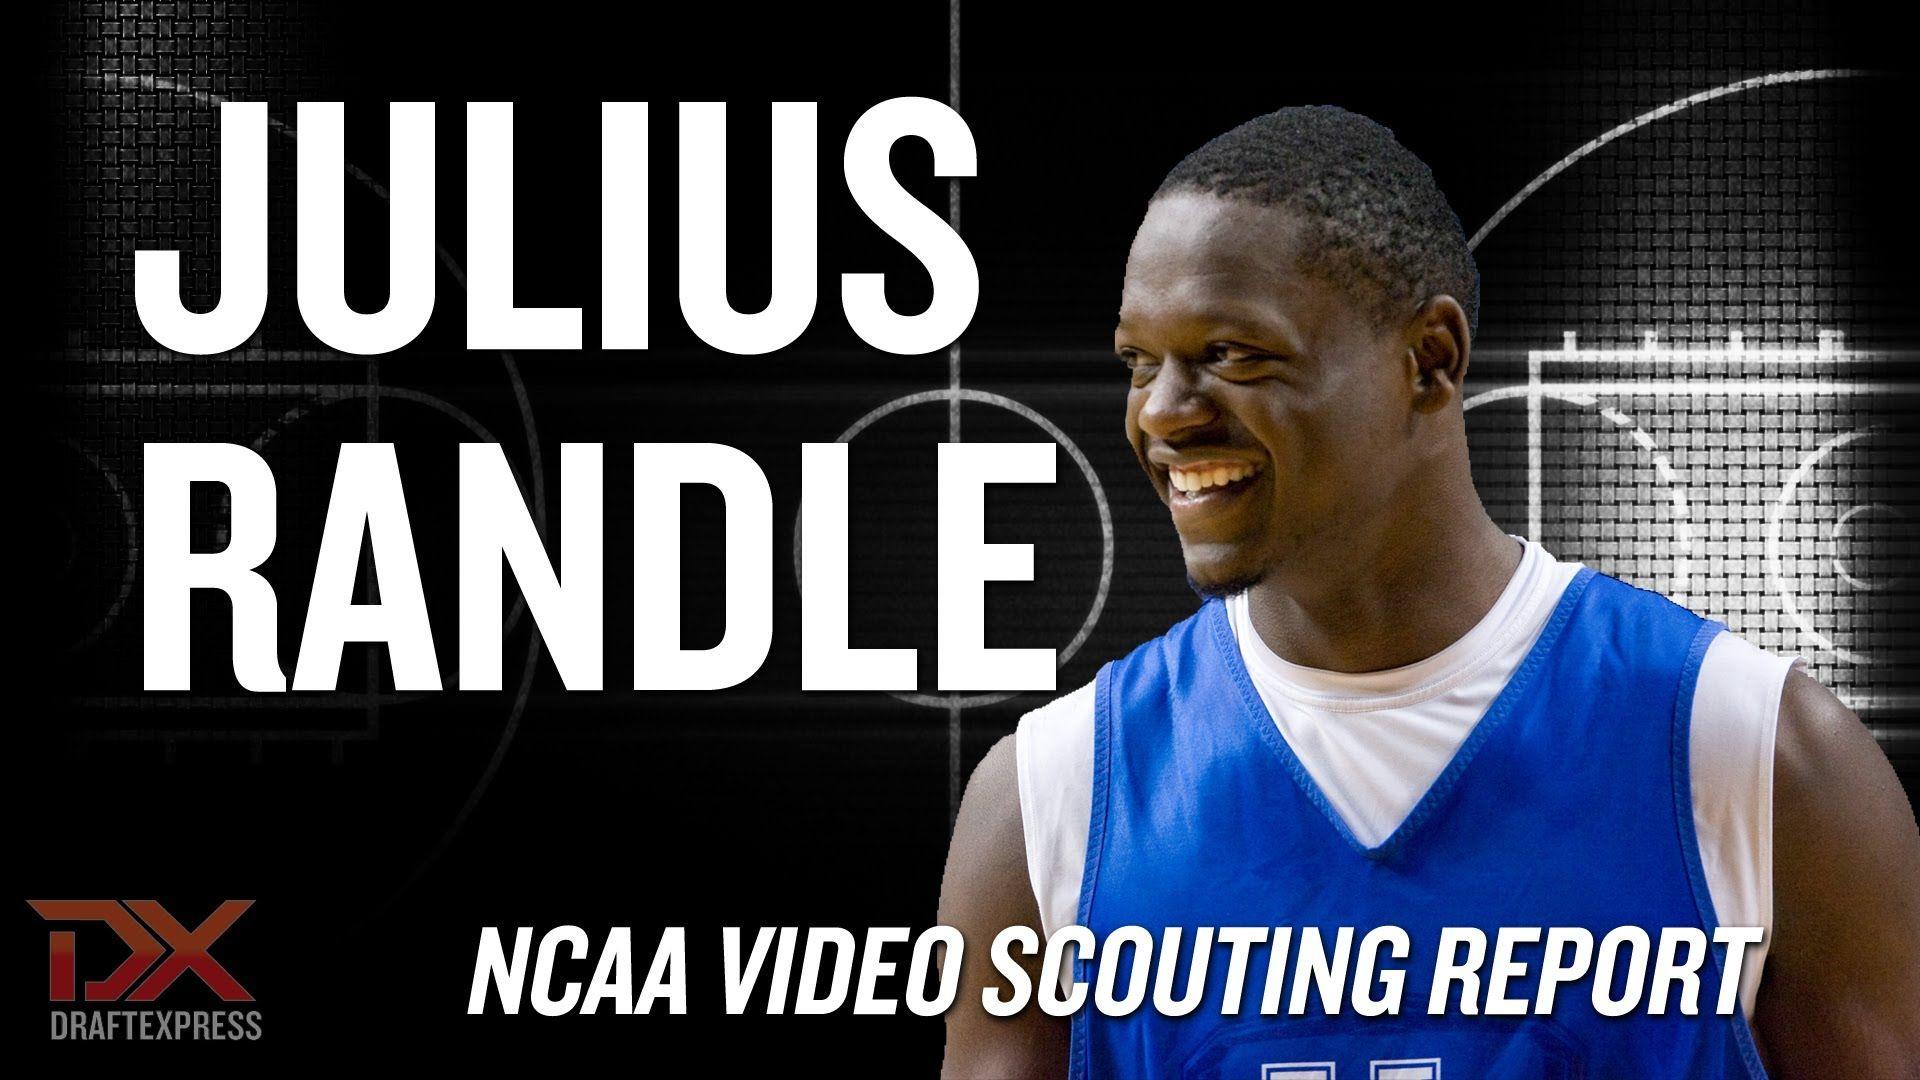 Julius Randle 2013 Scouting Video